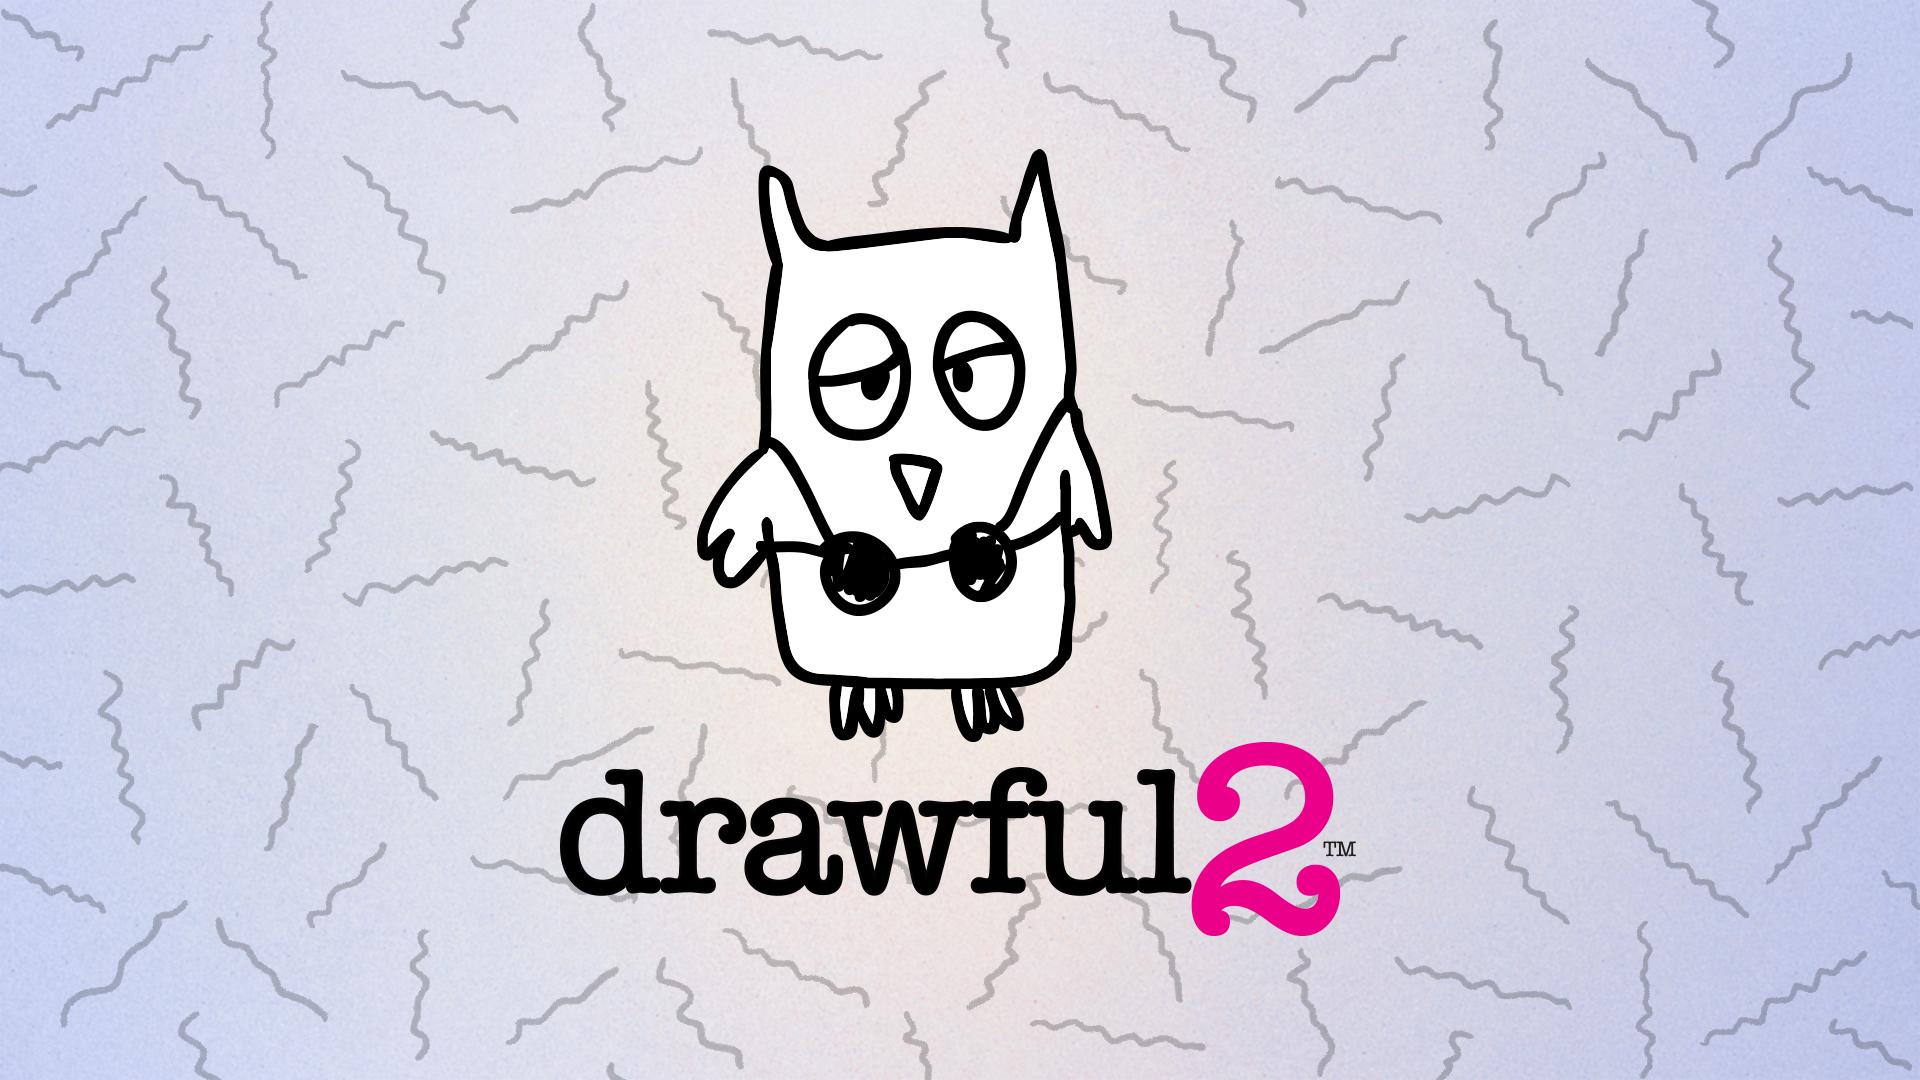 O.a. Drawful 2 bijna gratis in US eShop